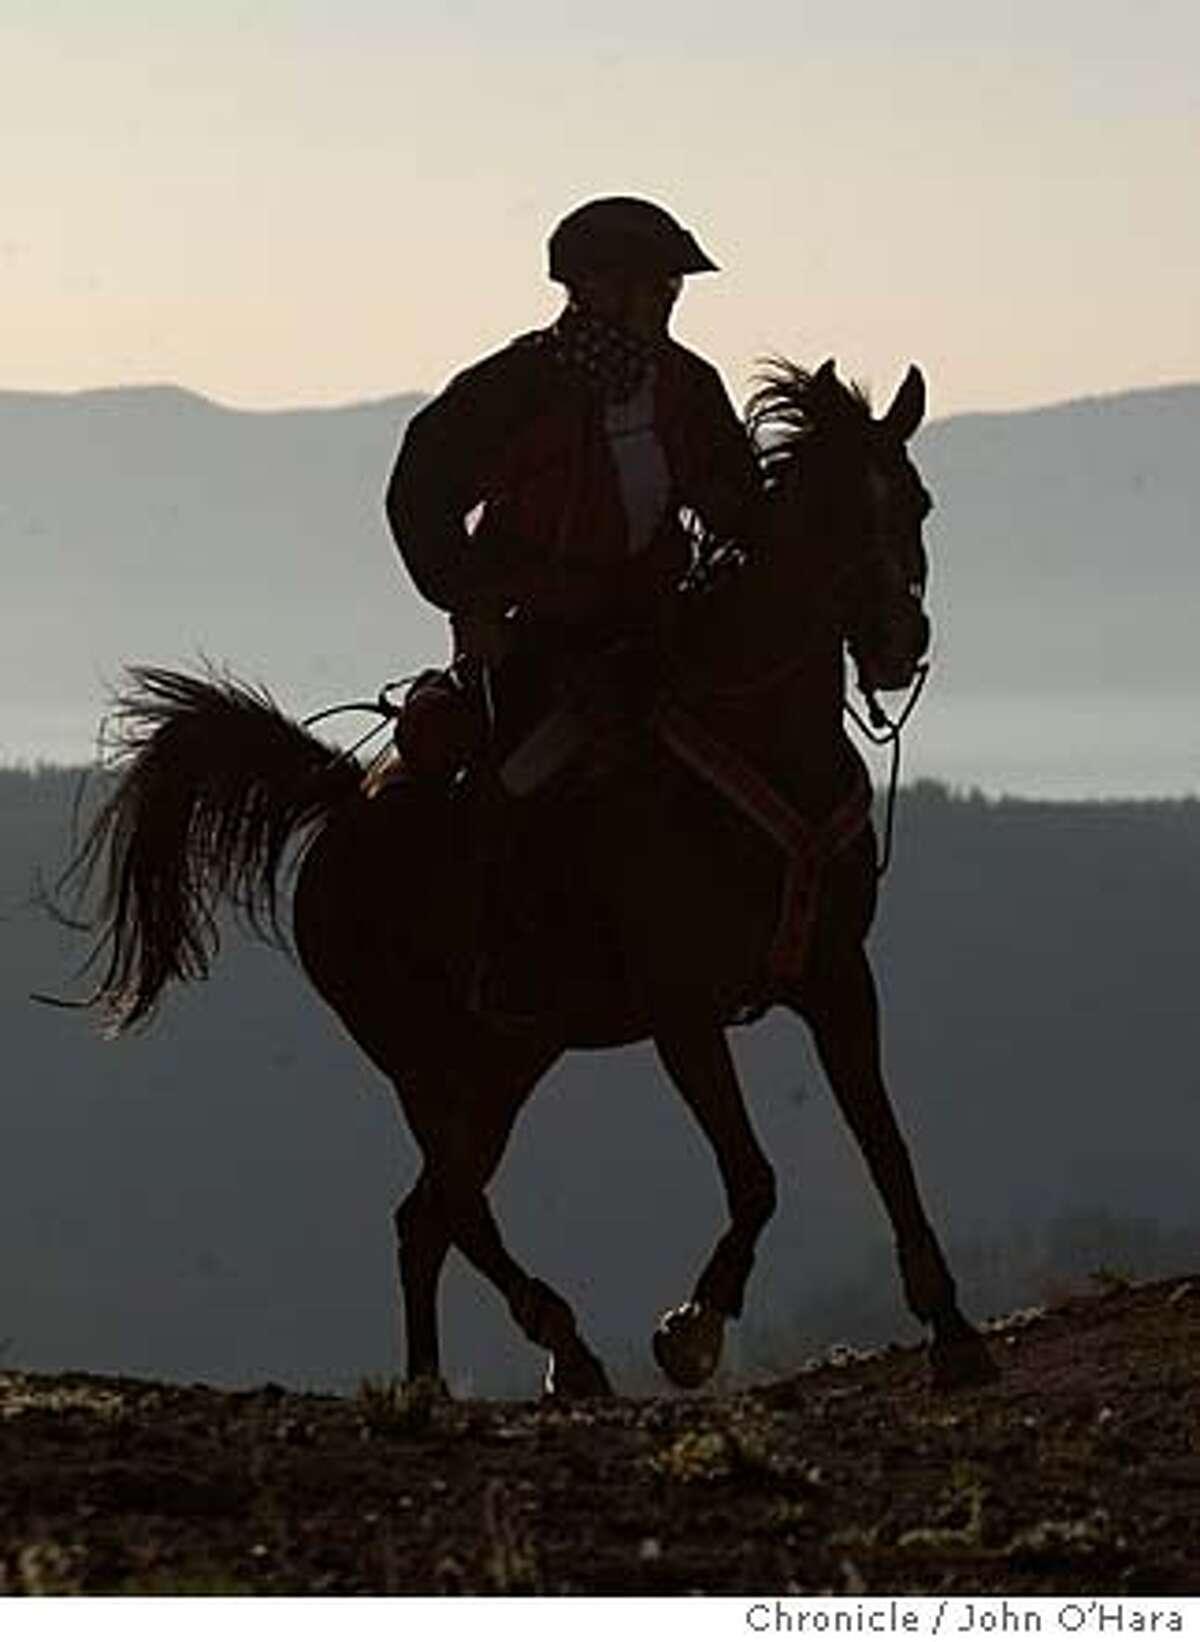 #222, Stephen Rojek, South Woodstock, VT. horse